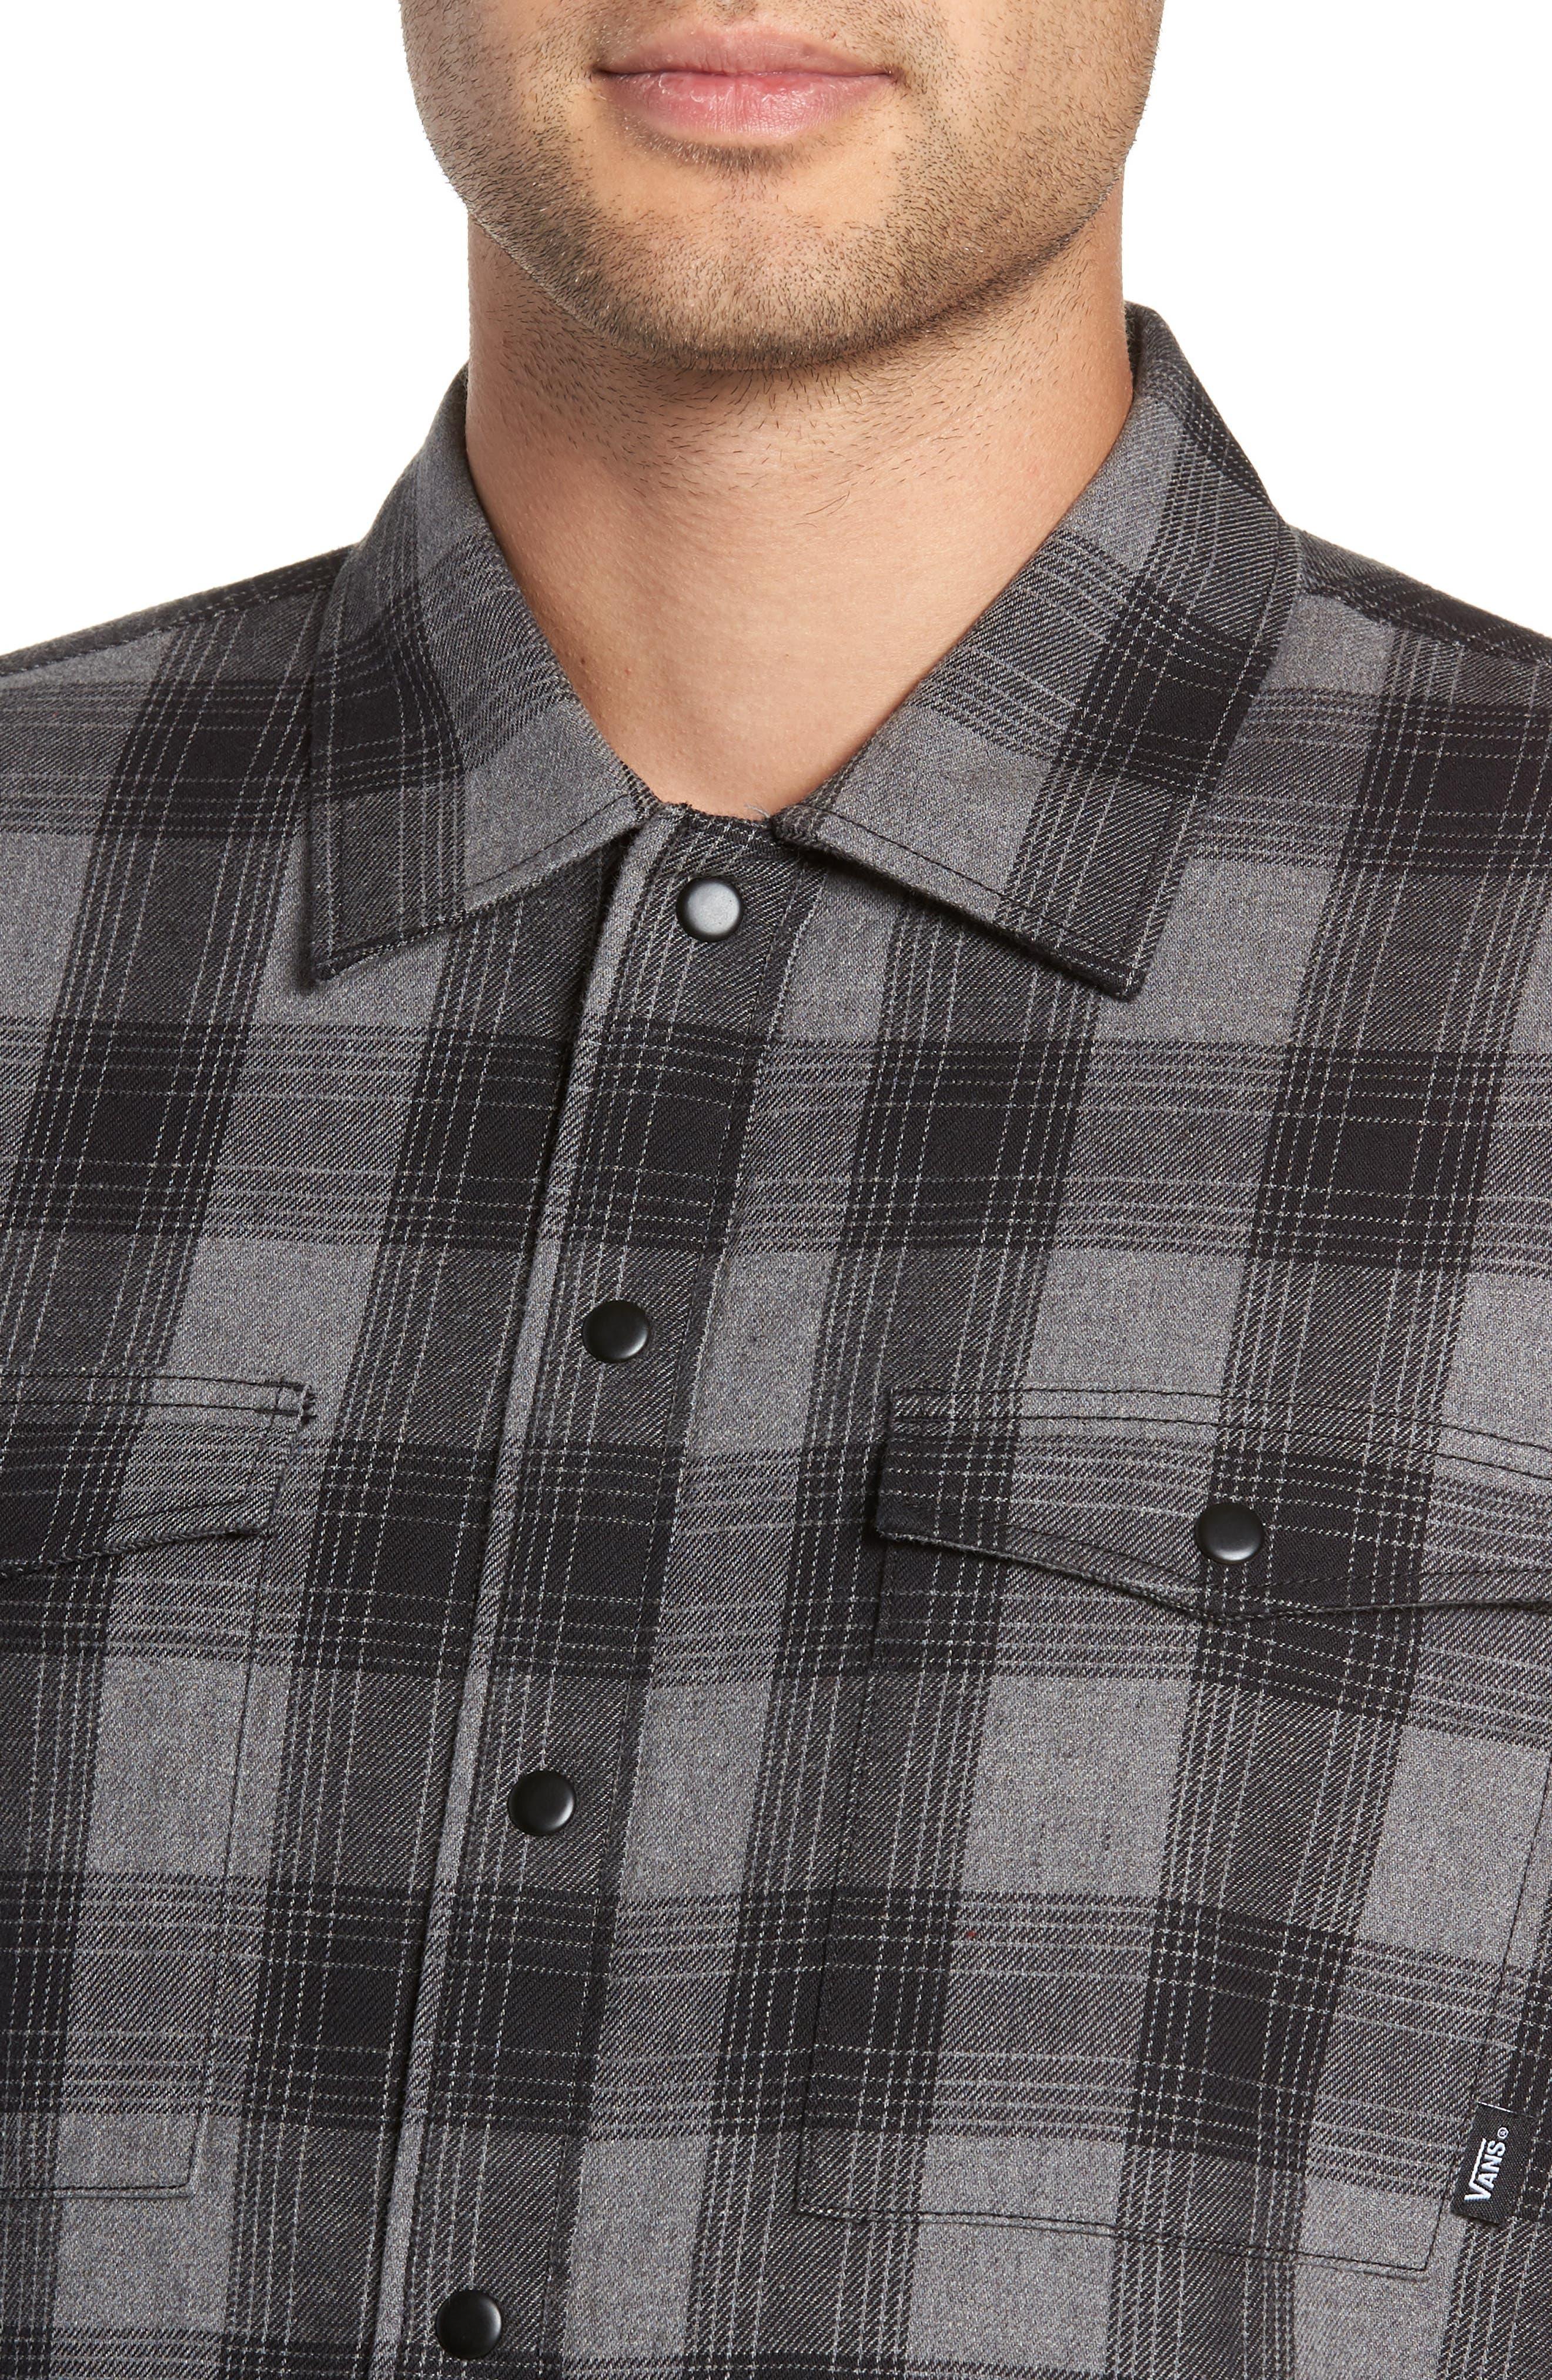 VANS,                             Parnell Plaid Shirt Jacket,                             Alternate thumbnail 4, color,                             GRAVEL HEATHER